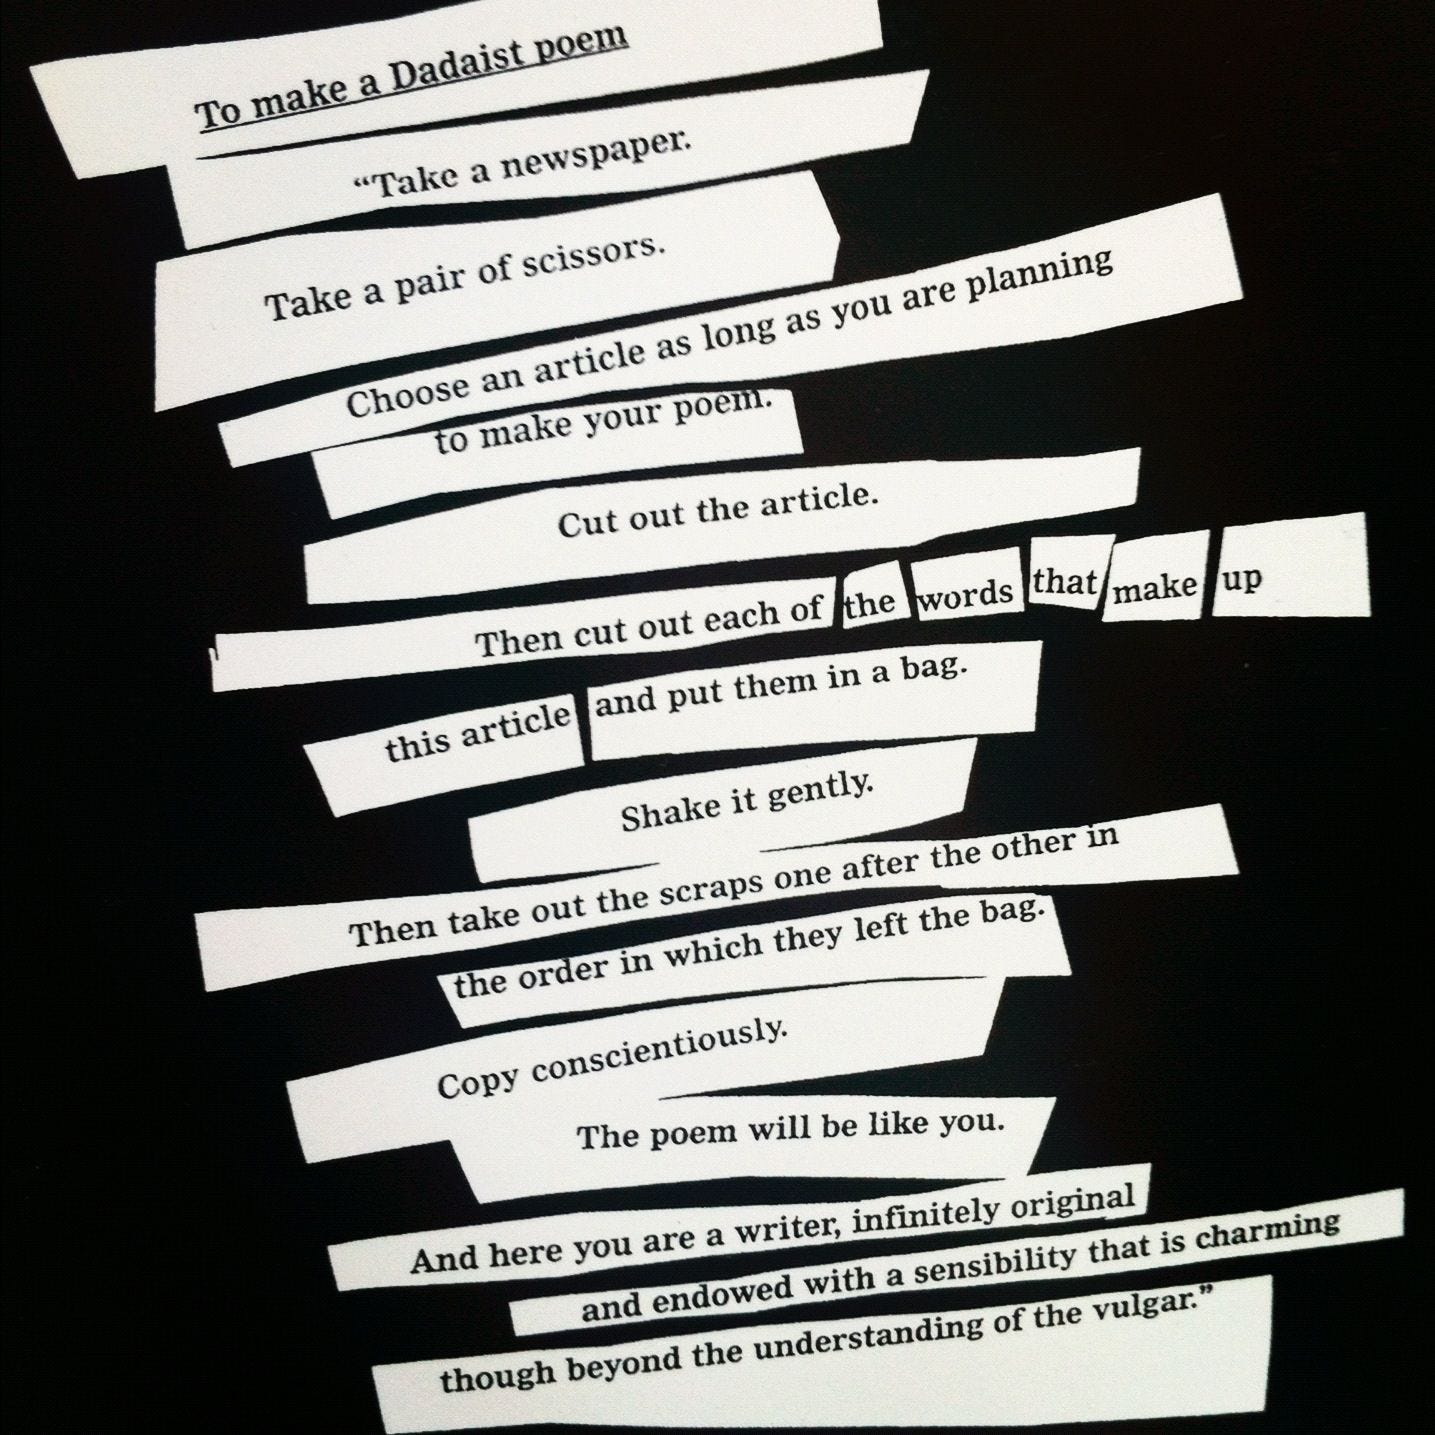 to-make-a-dadaist-poem-by-tristan-tzara.jpg (1435×1435) | Tristan tzara,  Poems, Dada poetry